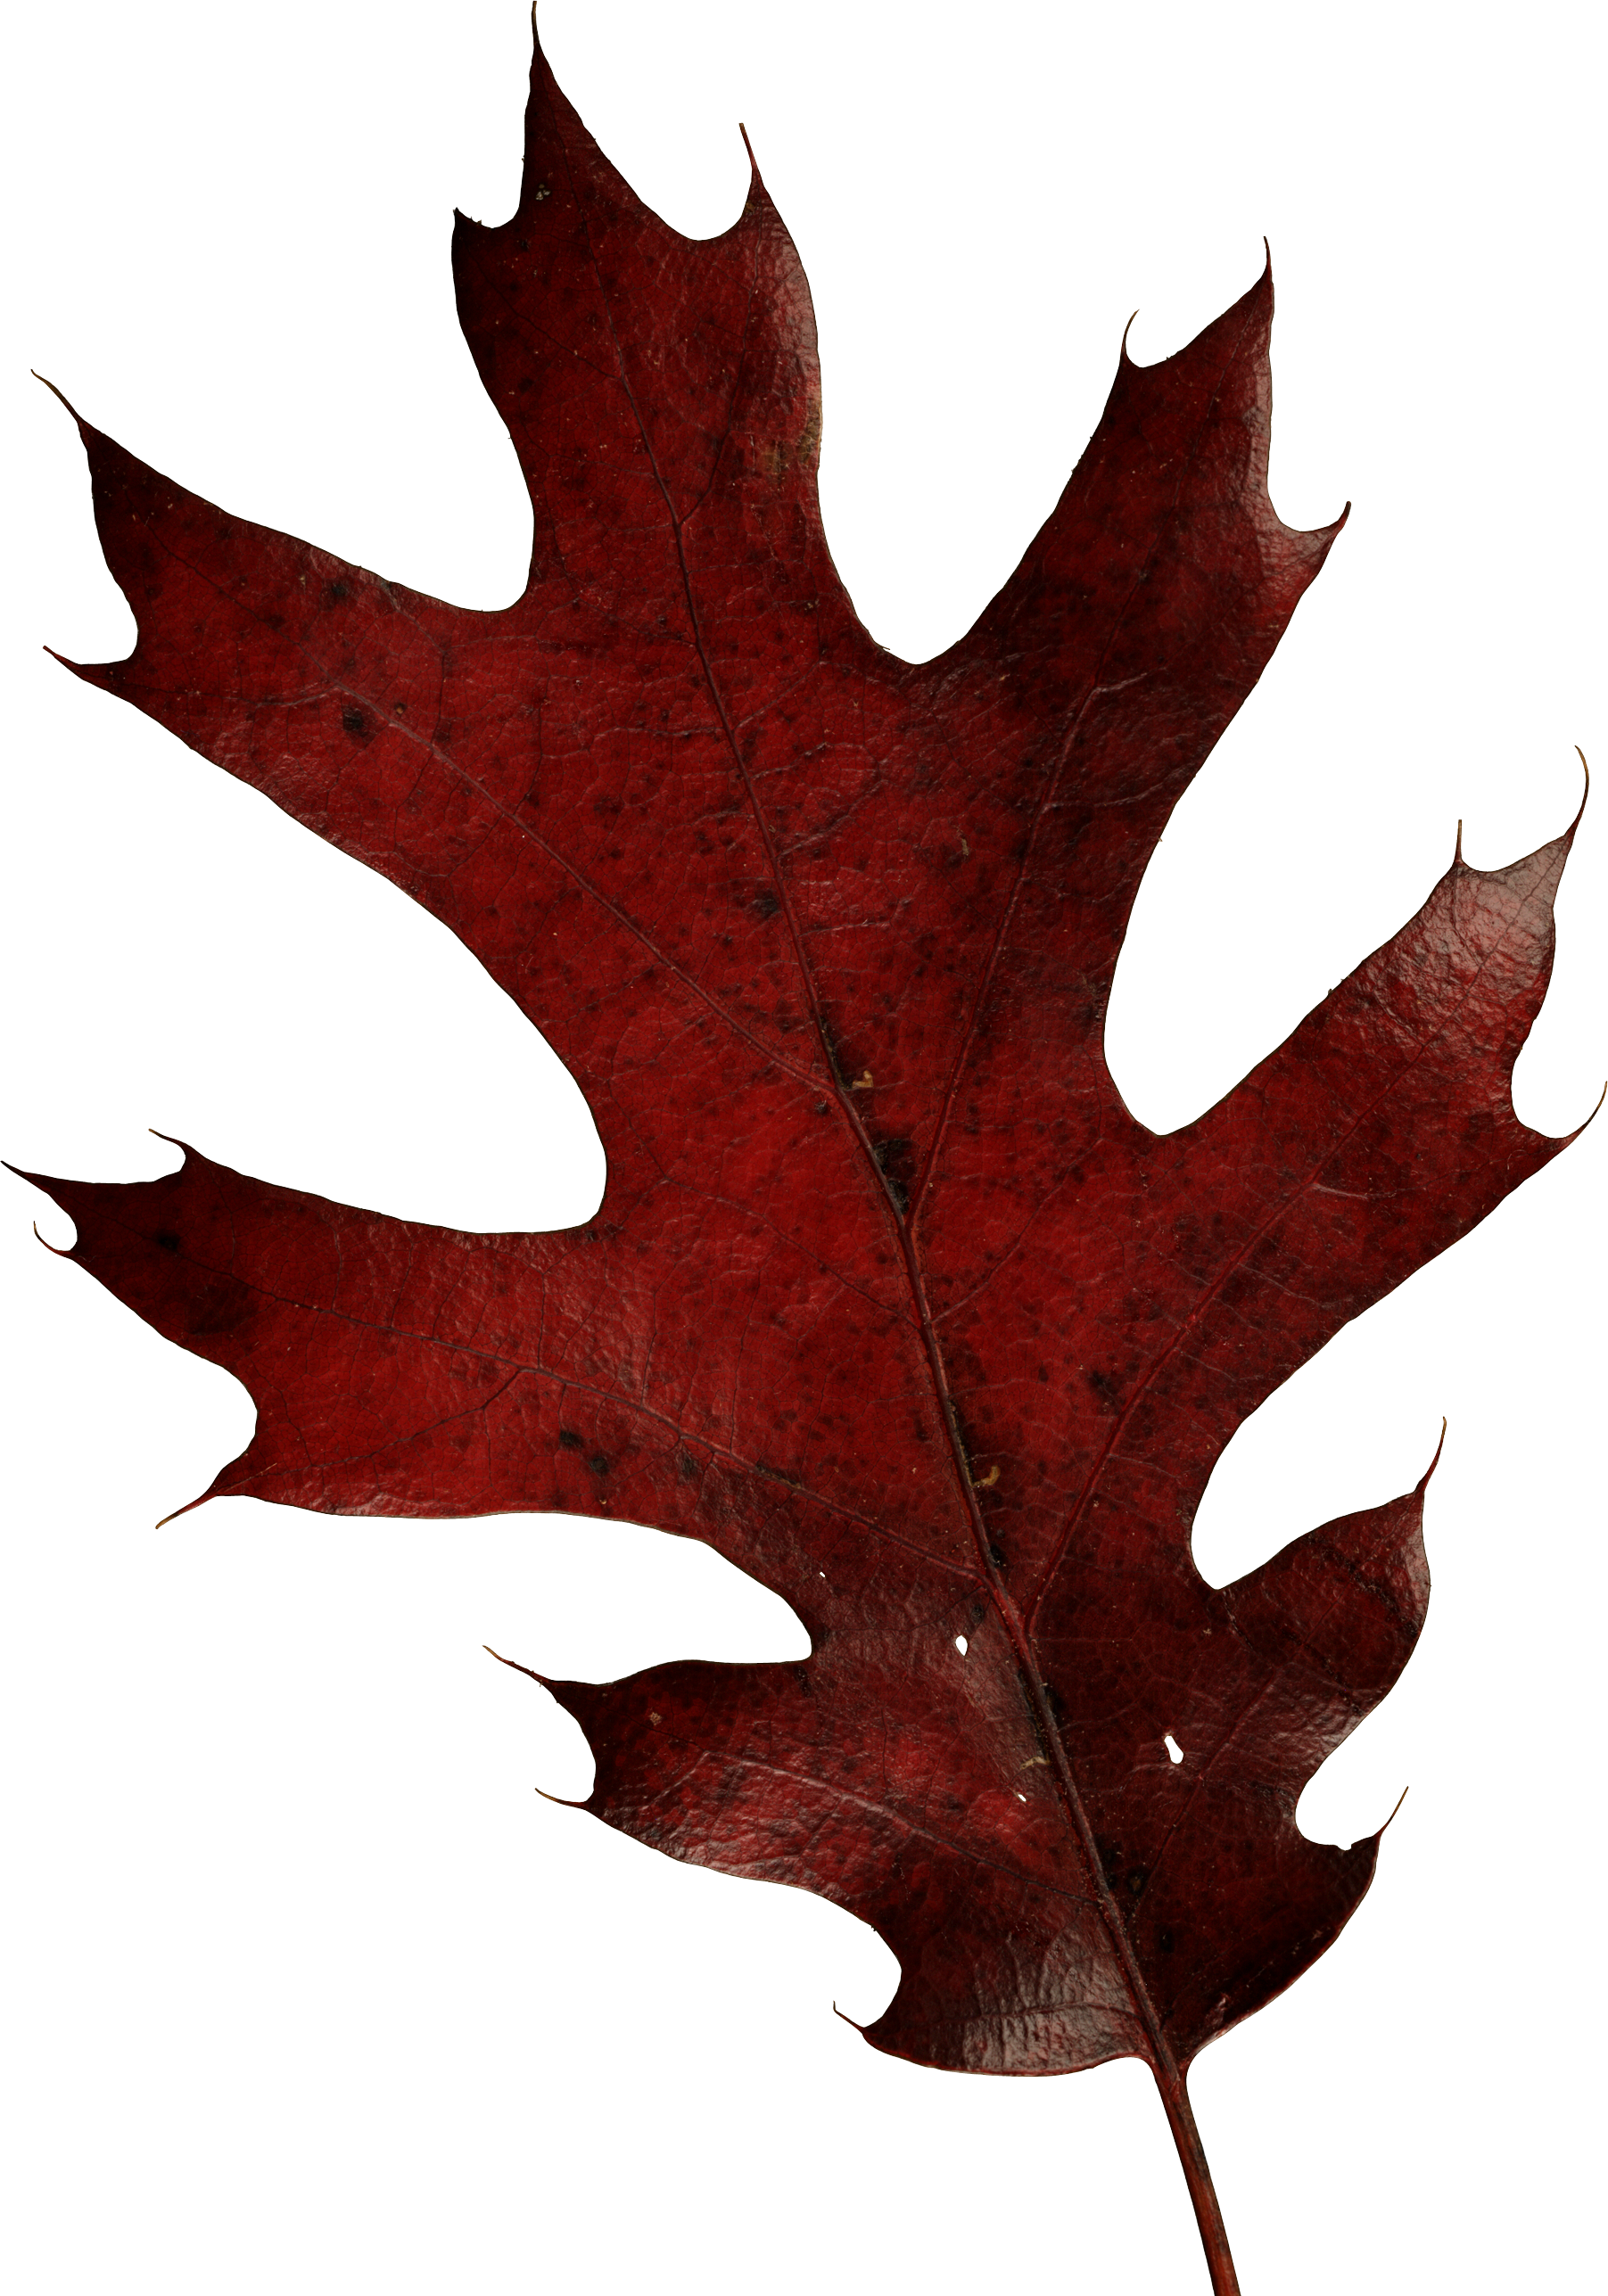 Autumn Leaves PNG Image - PurePNG | Free transparent CC0 ...